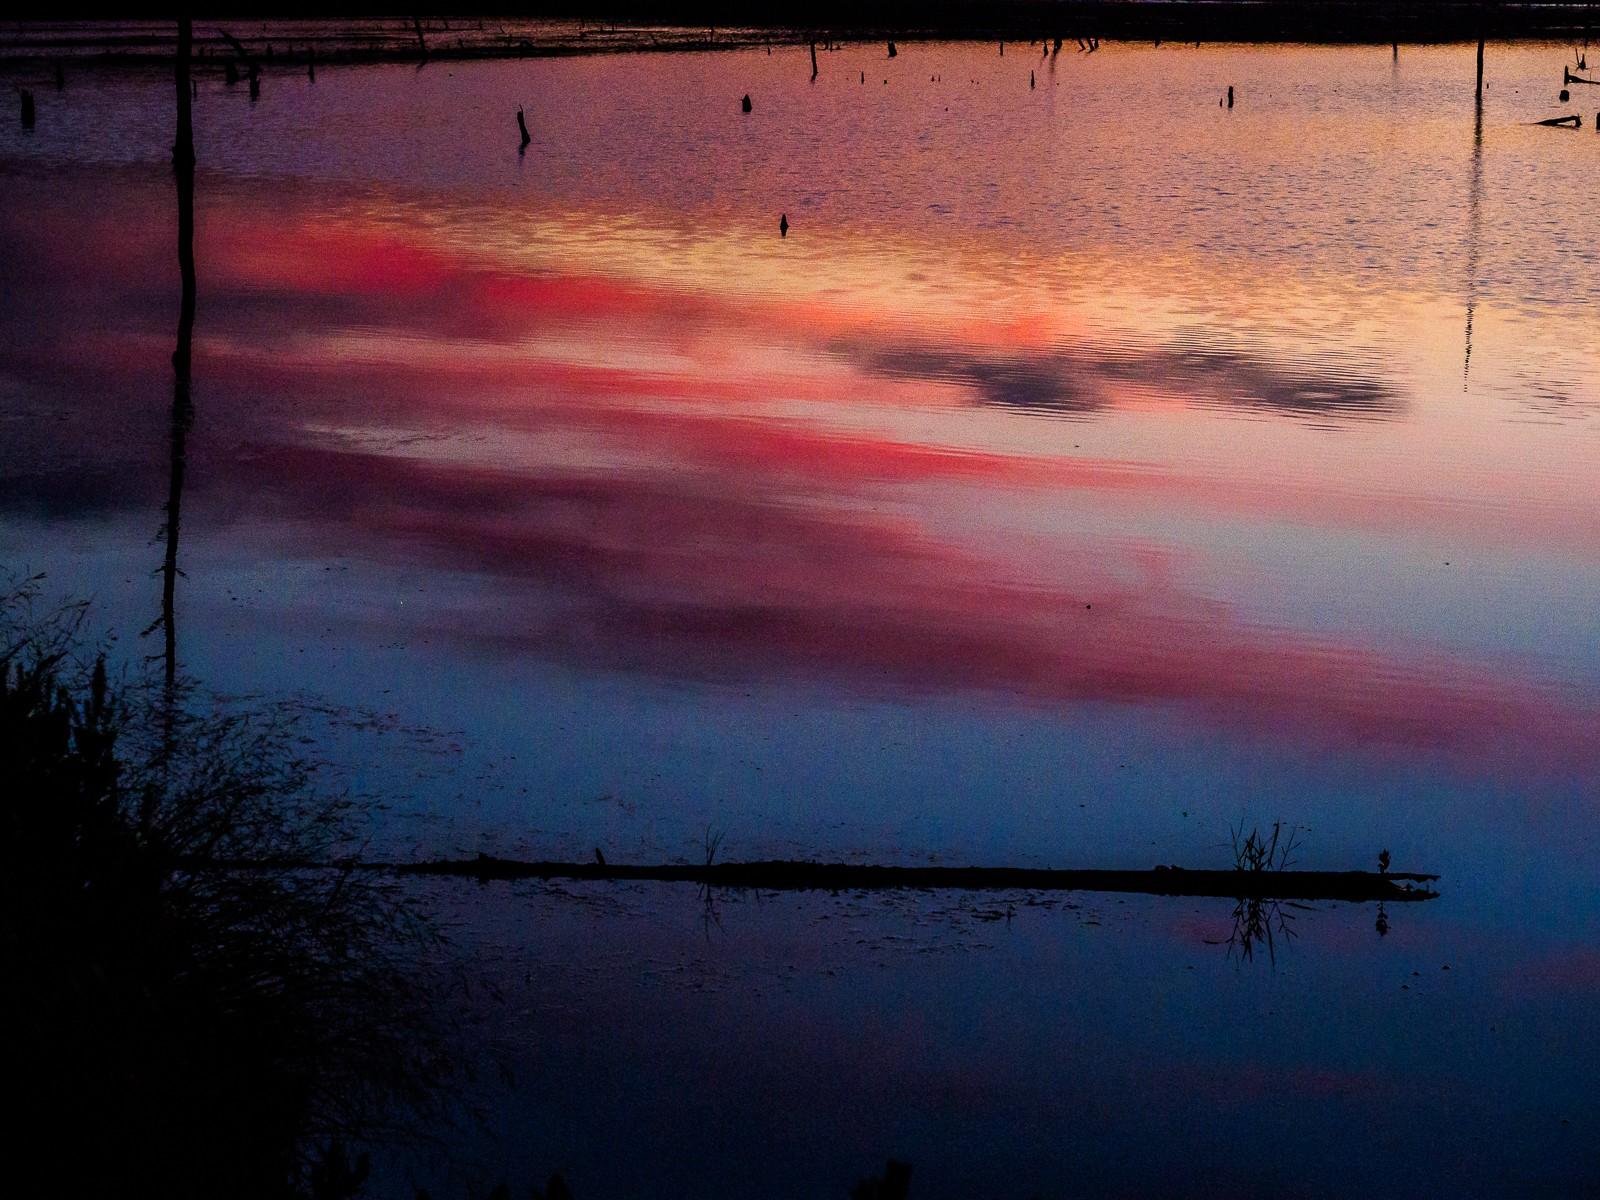 sunset-6646